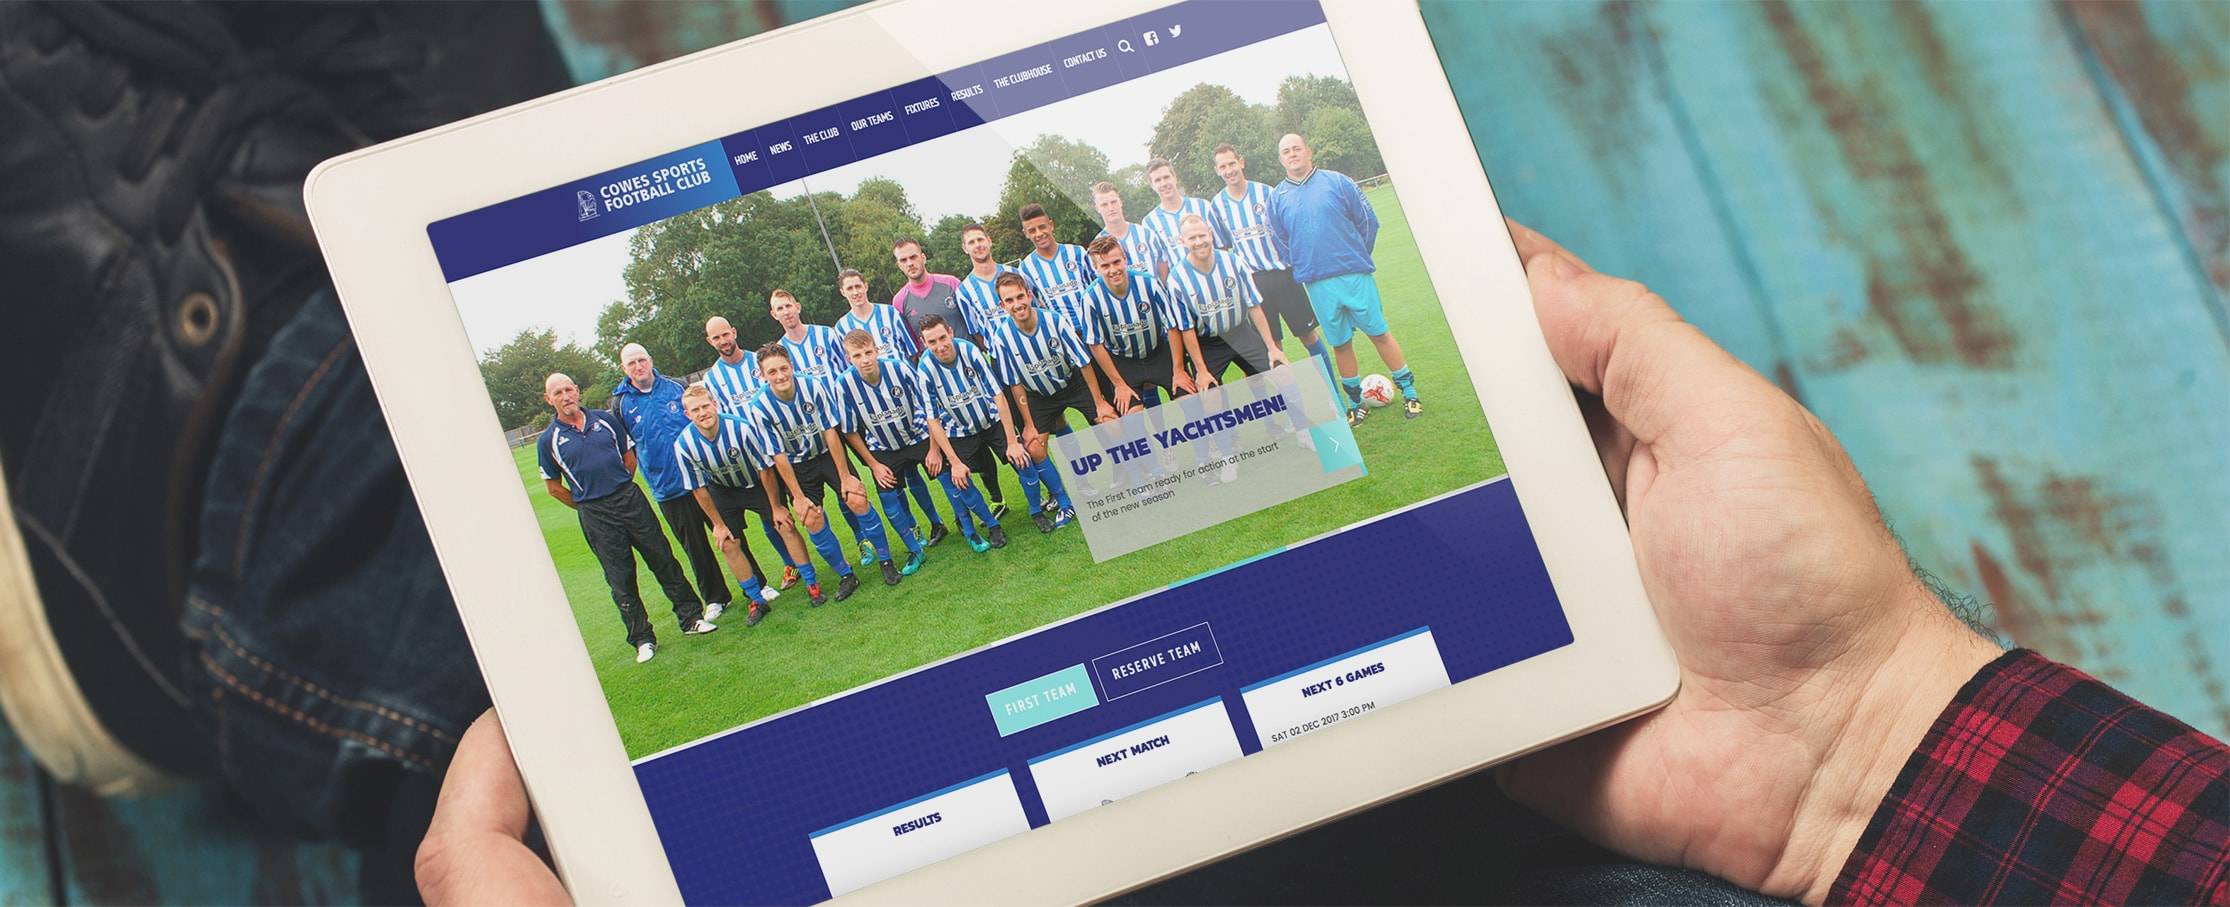 Football club tablet website design Cowes football club